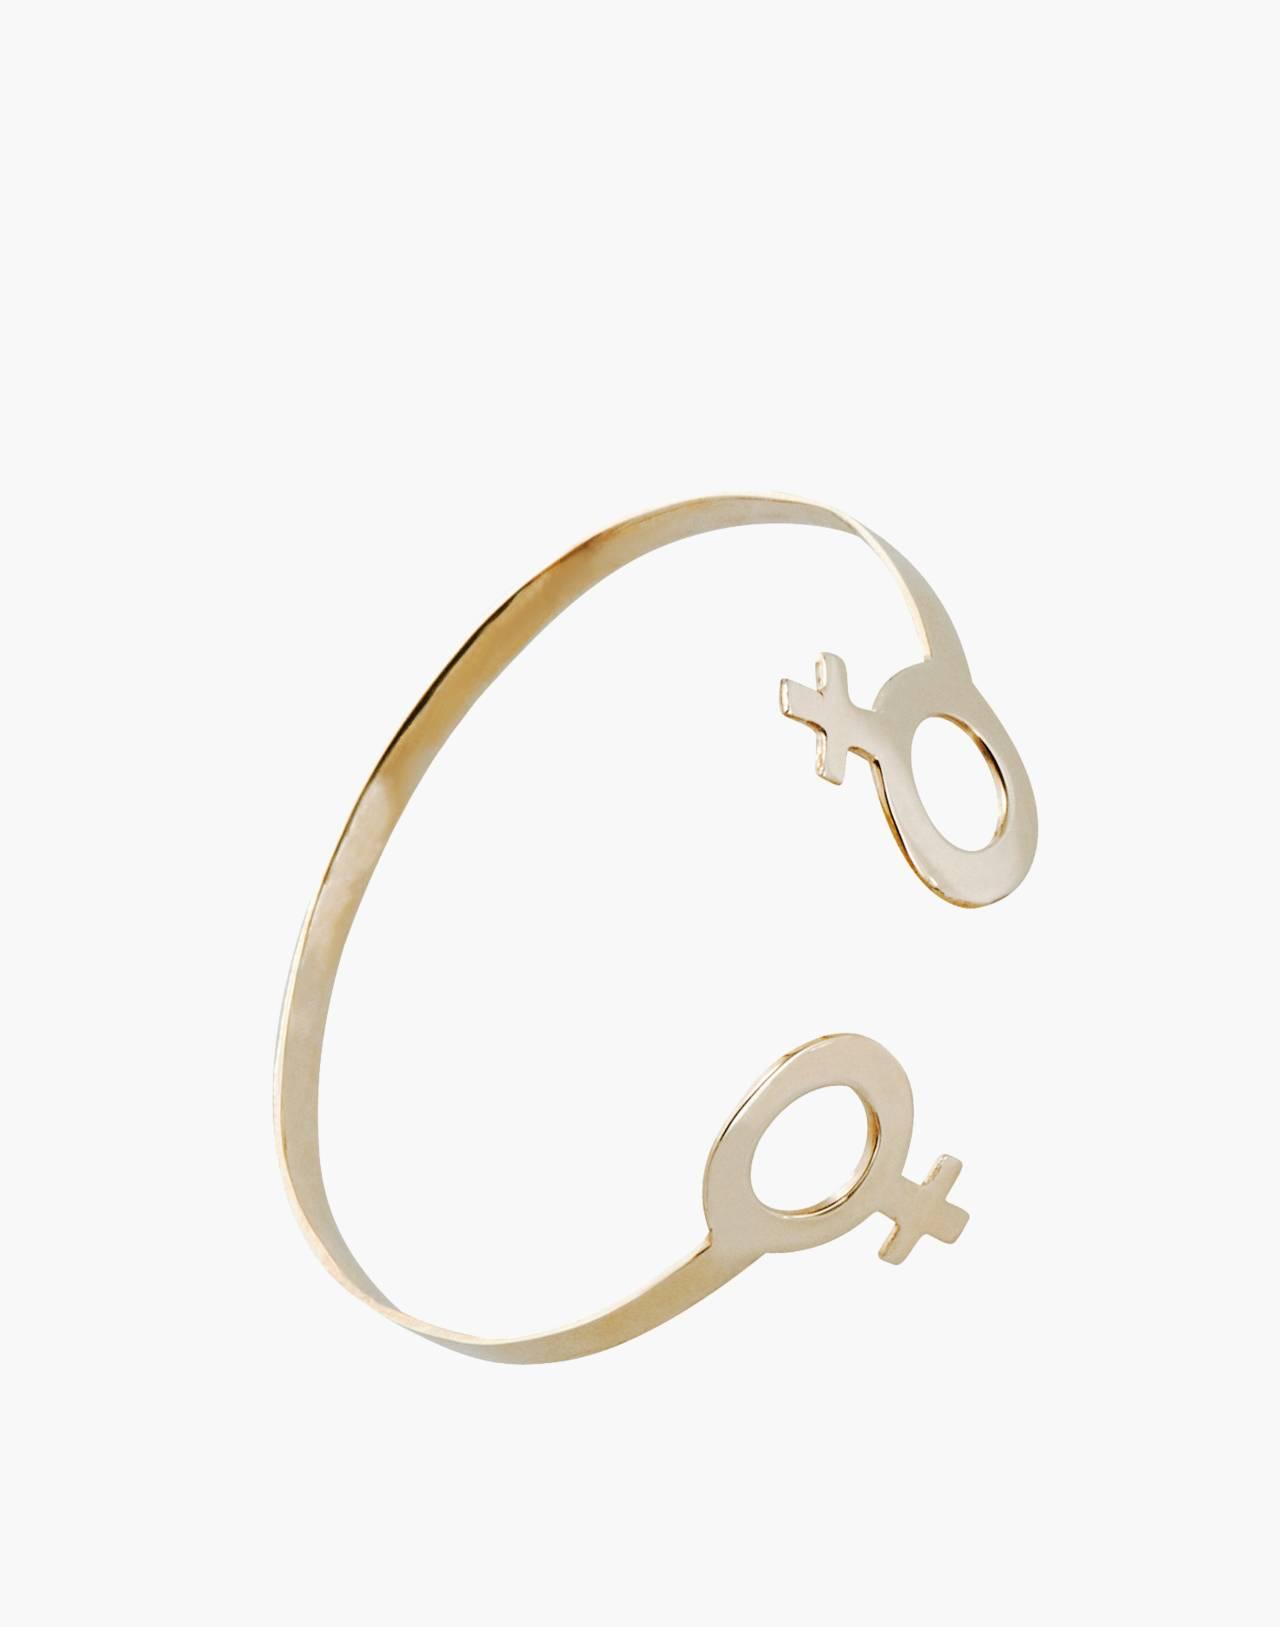 Charlotte Cauwe Studio Brass Female Cuff Bracelet in gold image 1